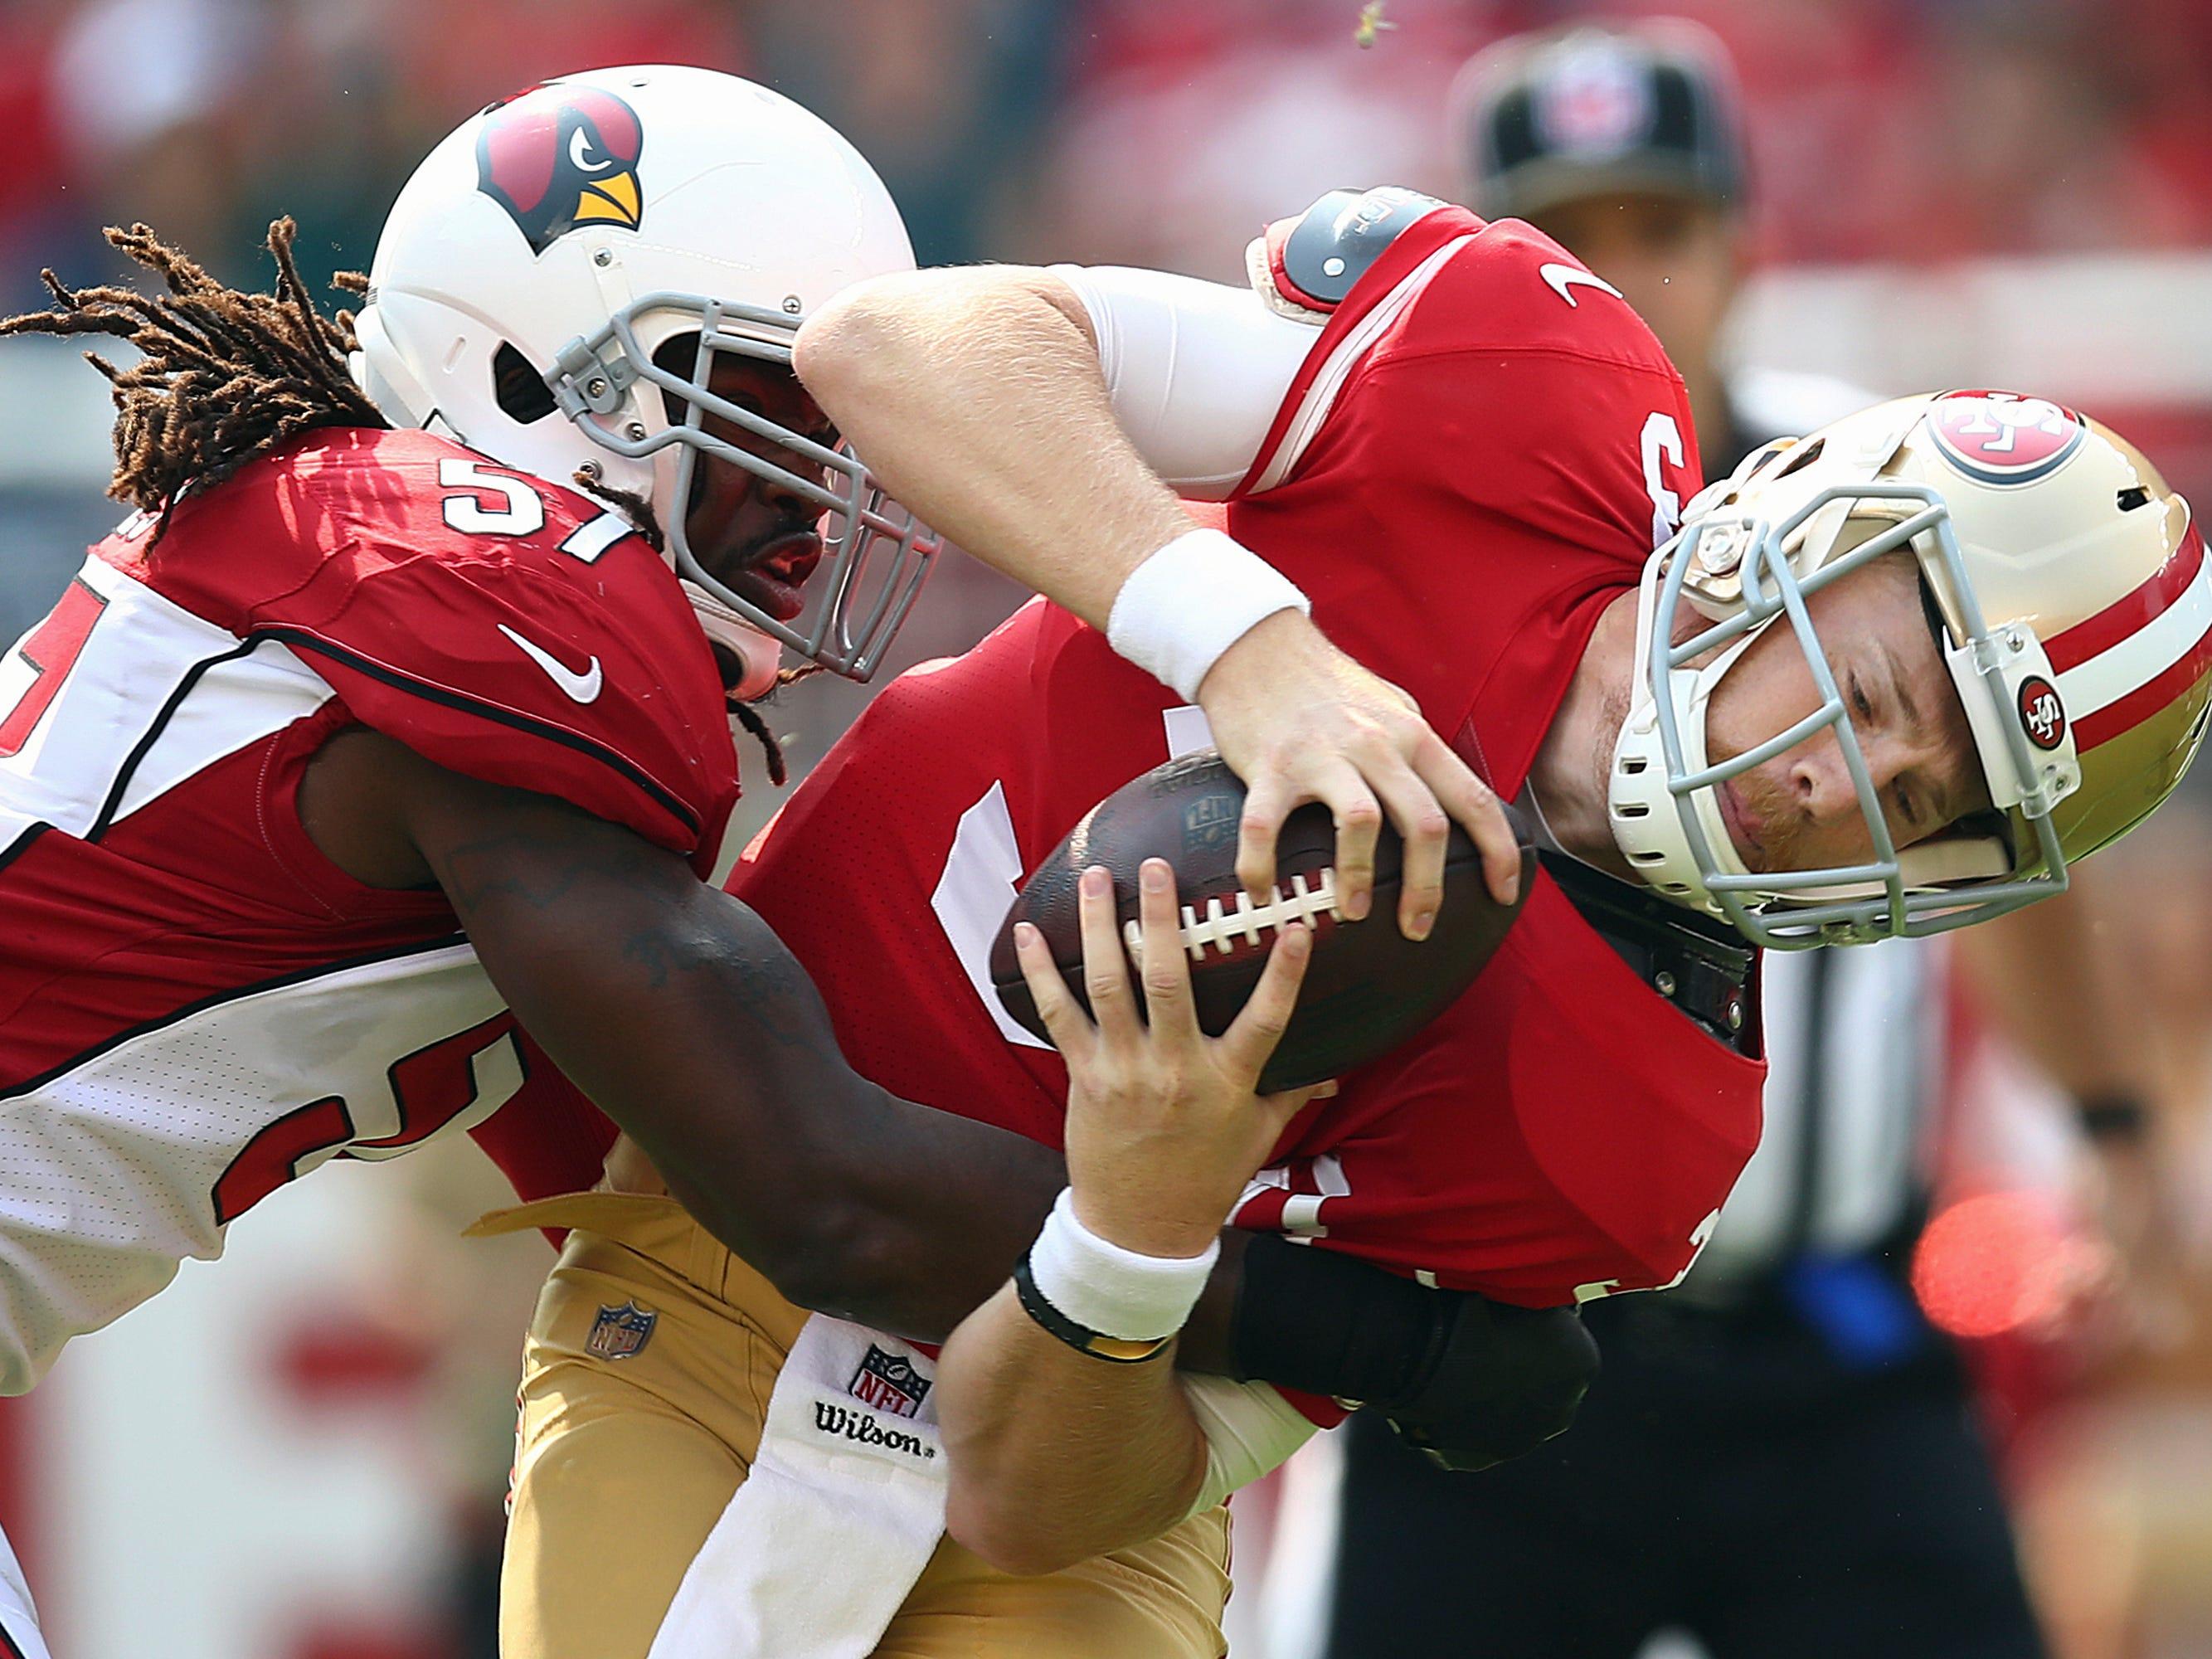 Arizona Cardinals linebacker Josh Bynes (57) sacks San Francisco 49ers quarterback C.J. Beathard (3) during the first half of an NFL football game in Santa Clara, Calif., Sunday, Oct. 7, 2018.